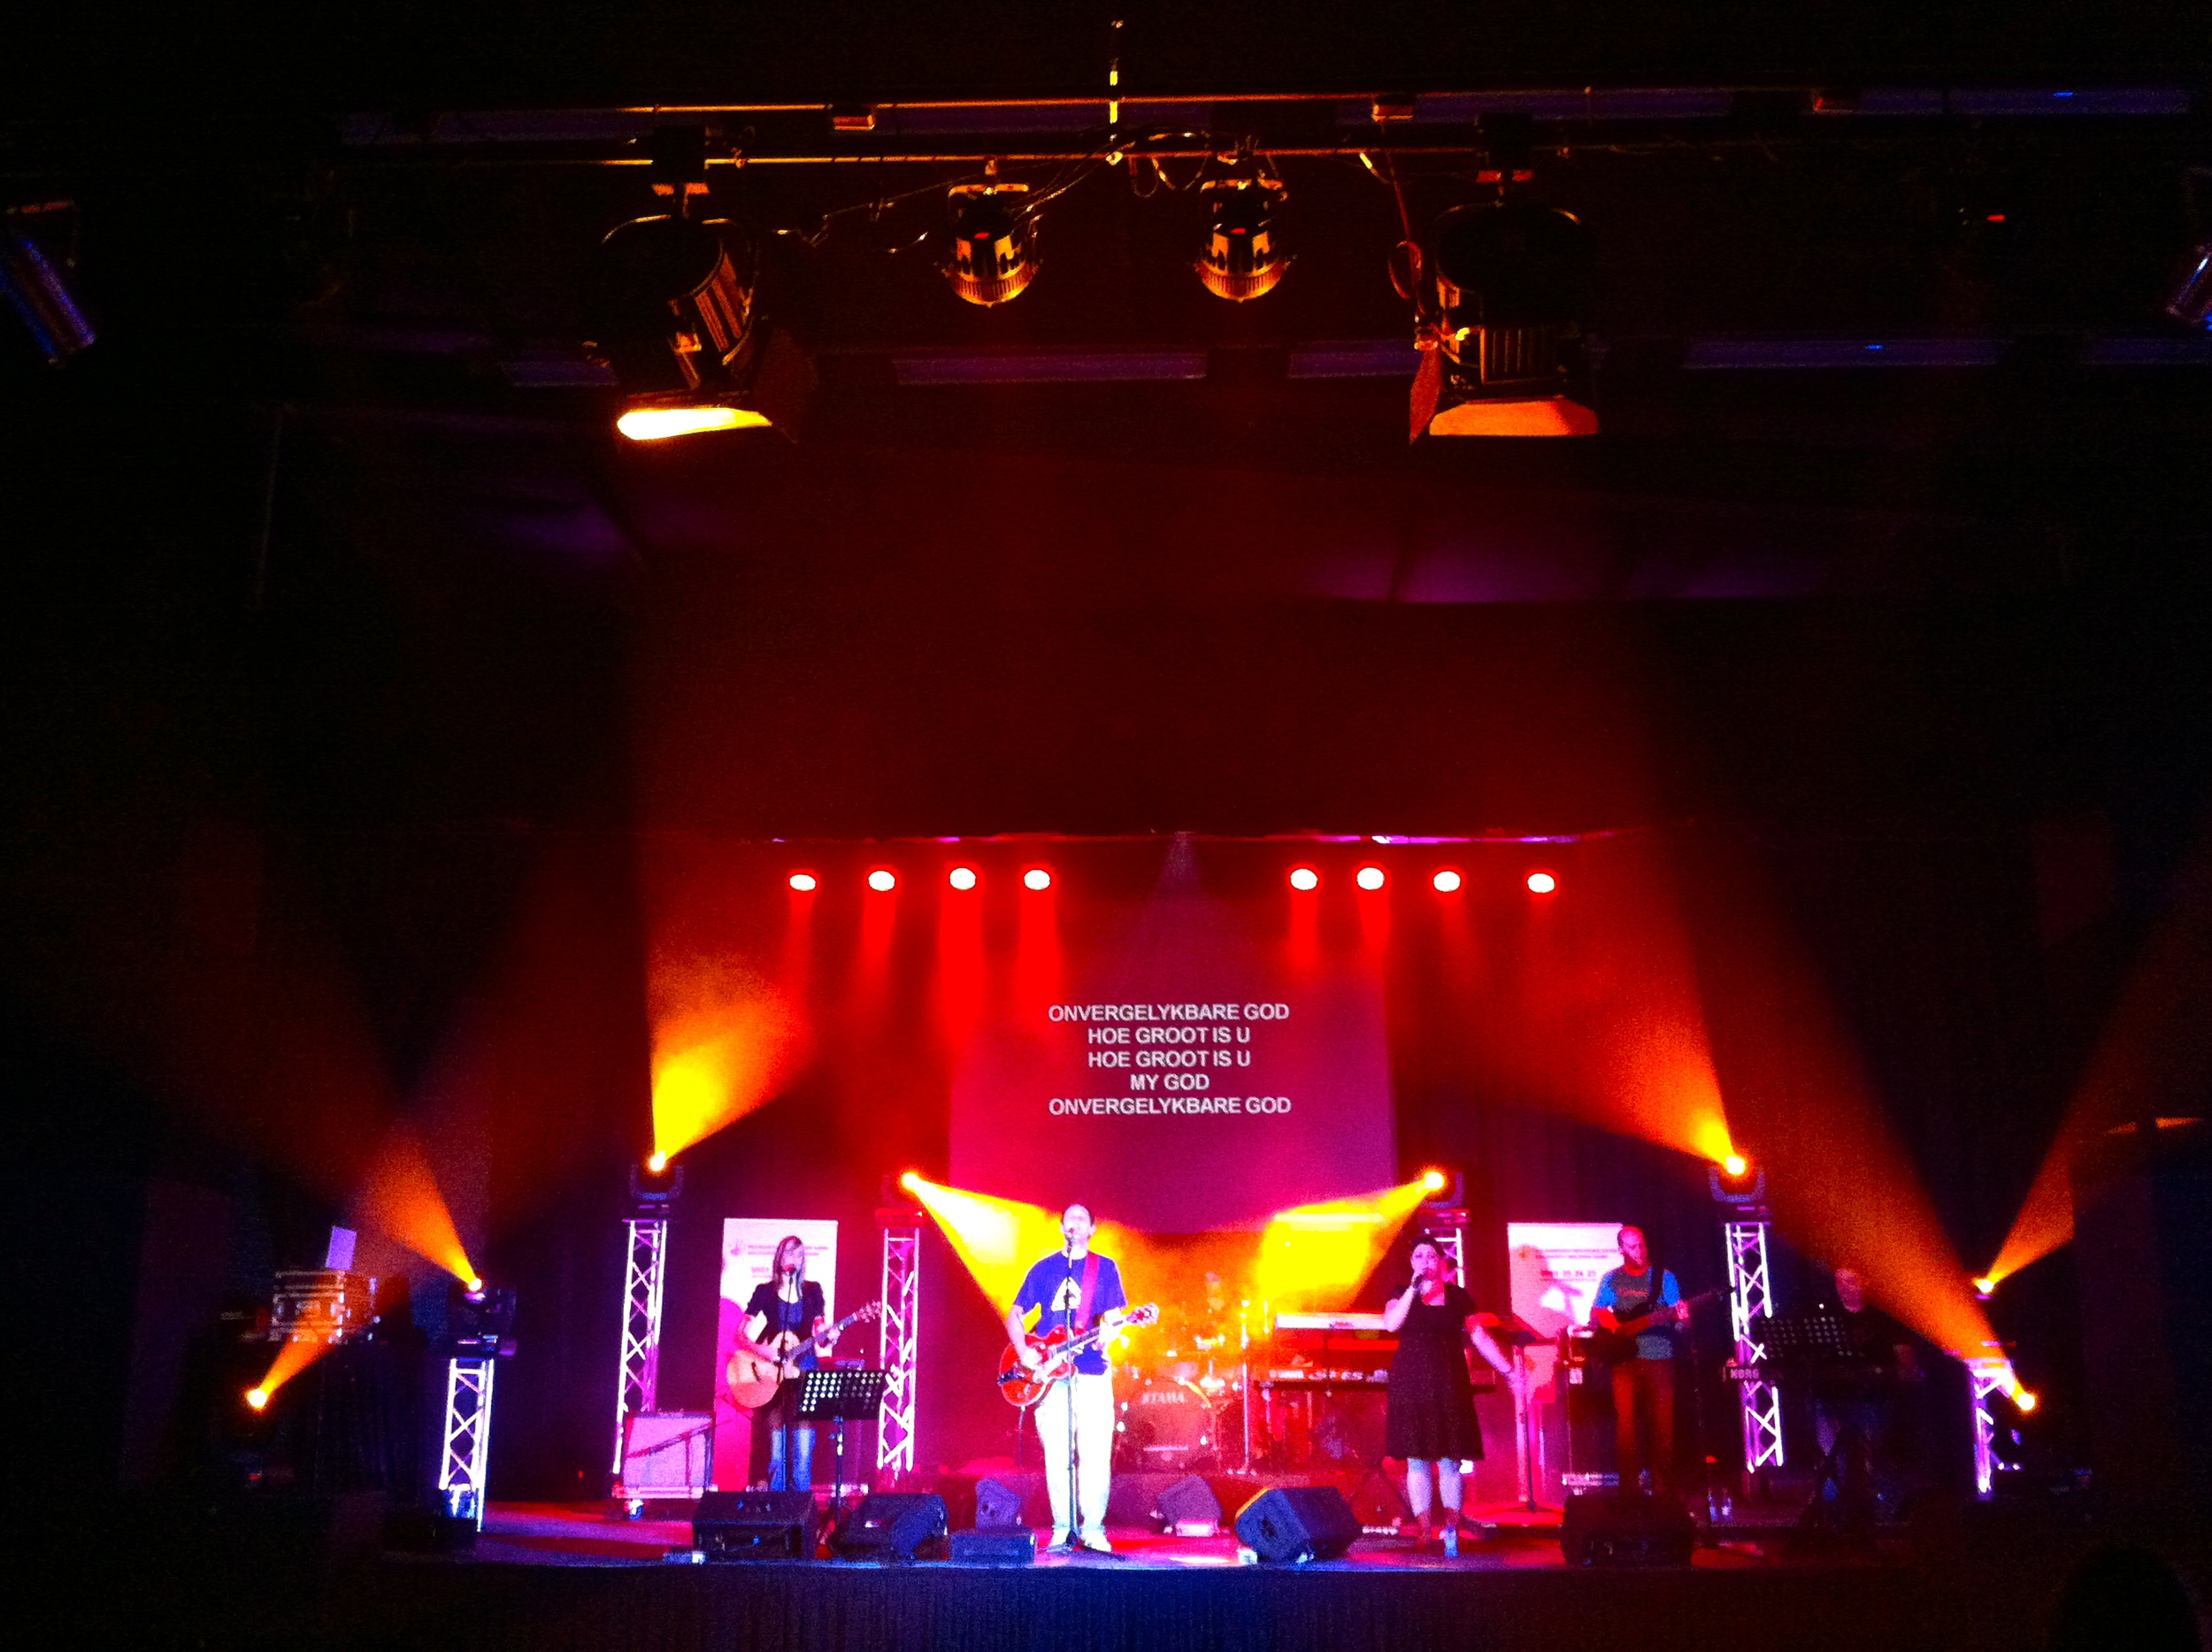 Concert Theatre Venue